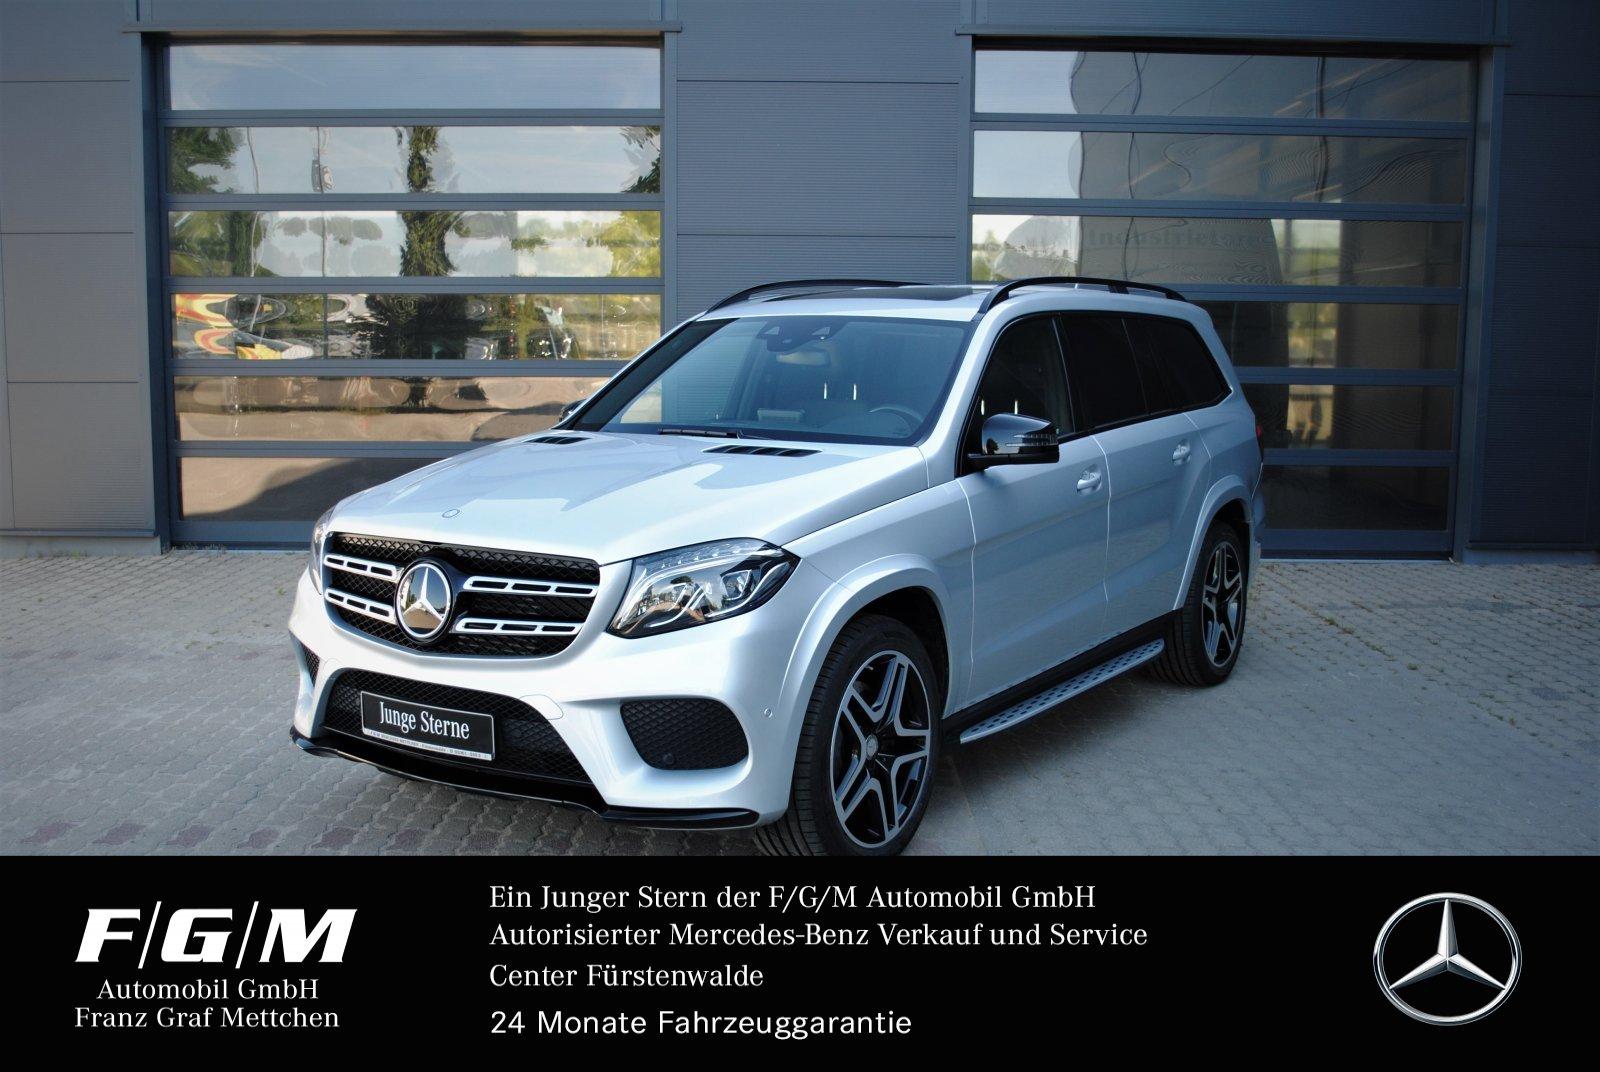 Mercedes-Benz GLS 350 d AMG/Com/ILS/Night/Distr/Mem/SHD/H&K, Jahr 2016, Diesel